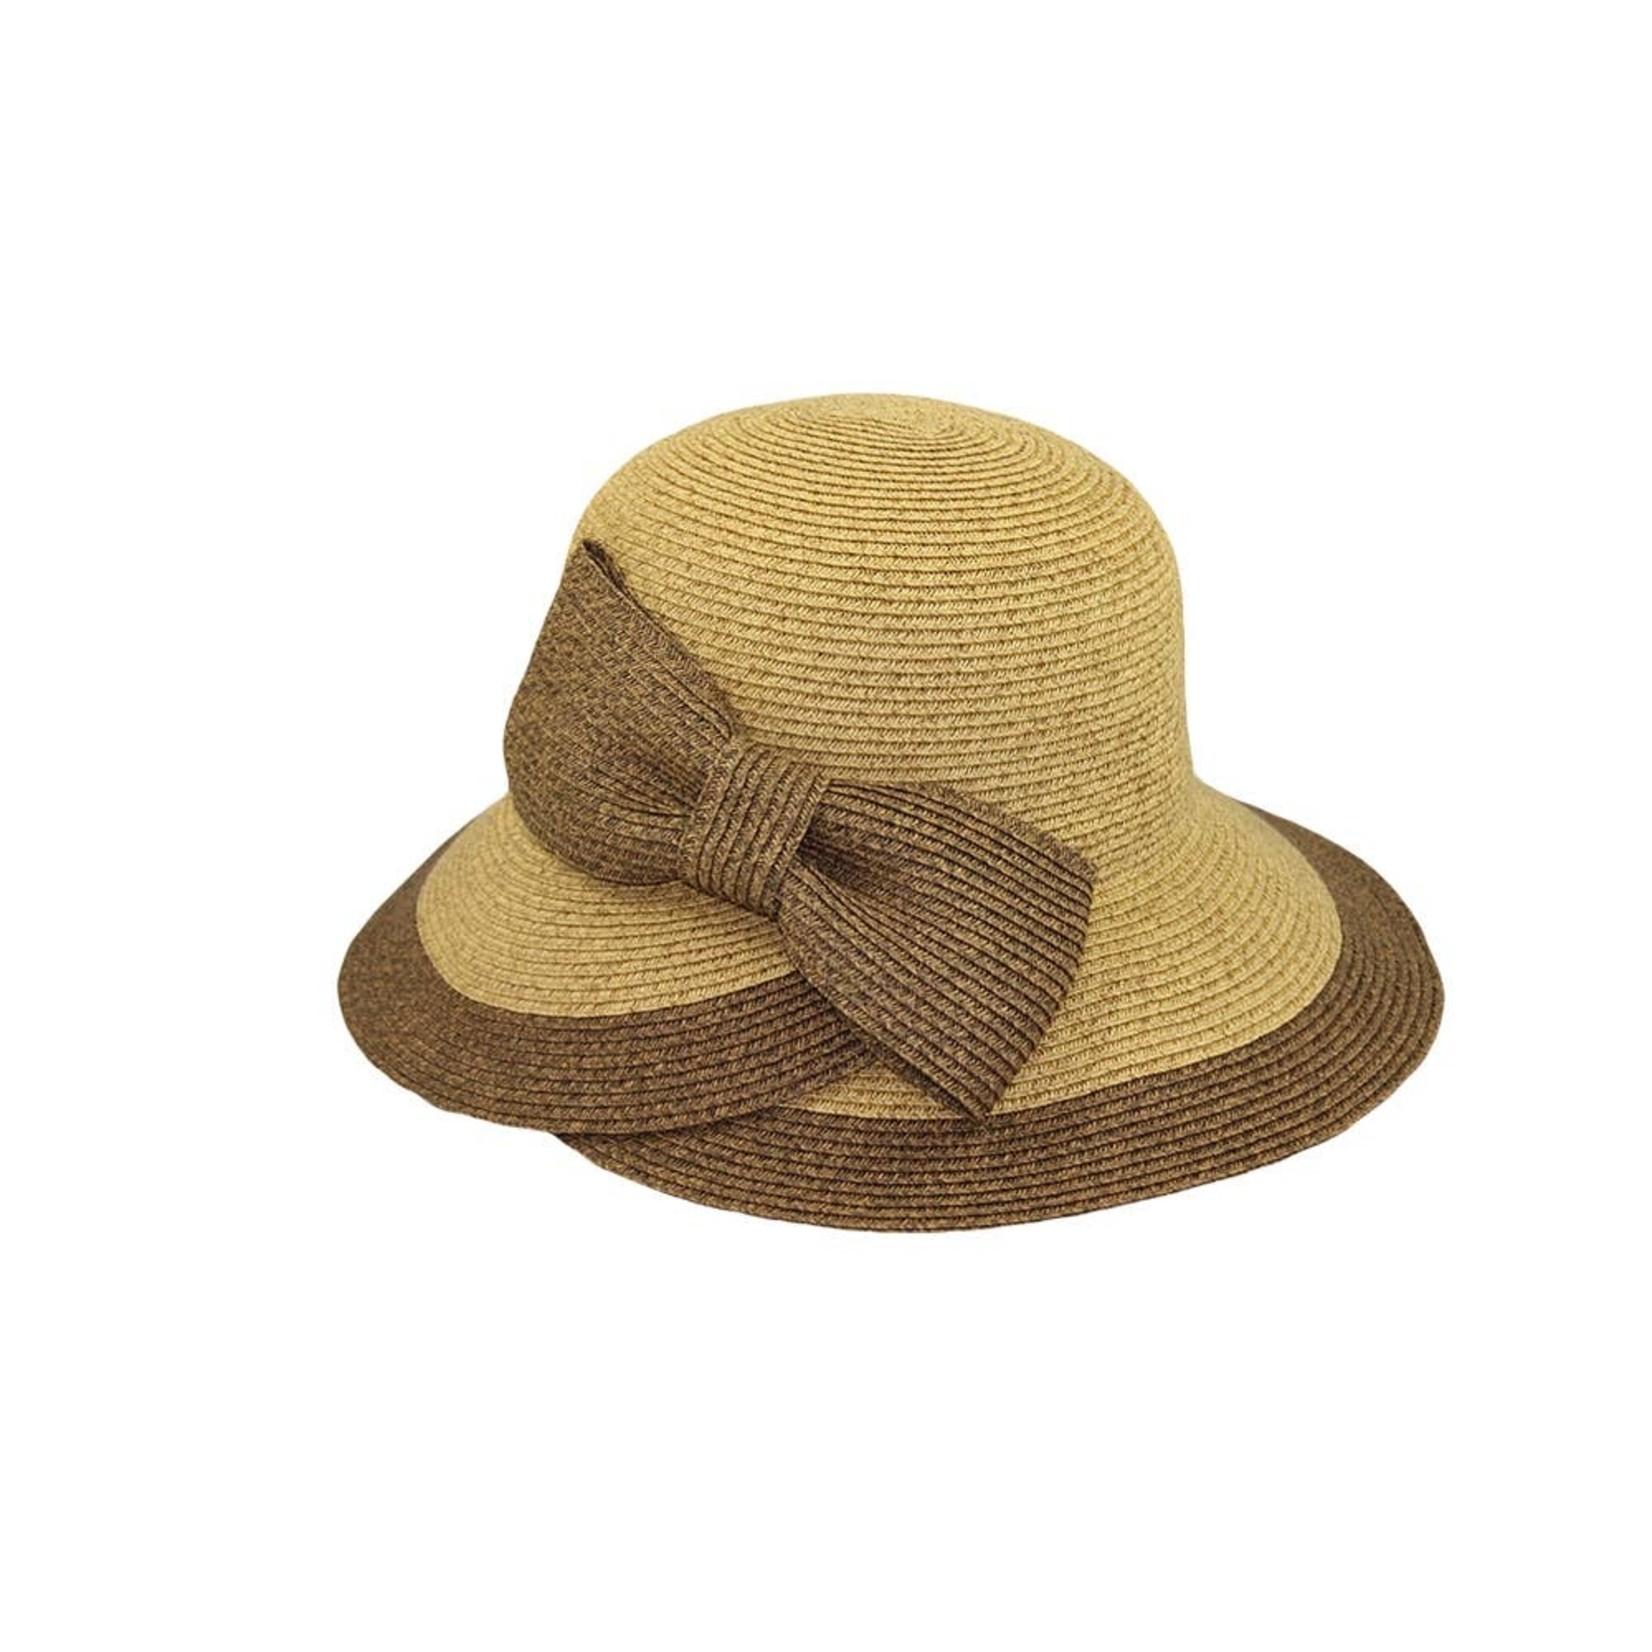 Hat Stack 70765 Hat w/Large Brown Tweed Bow